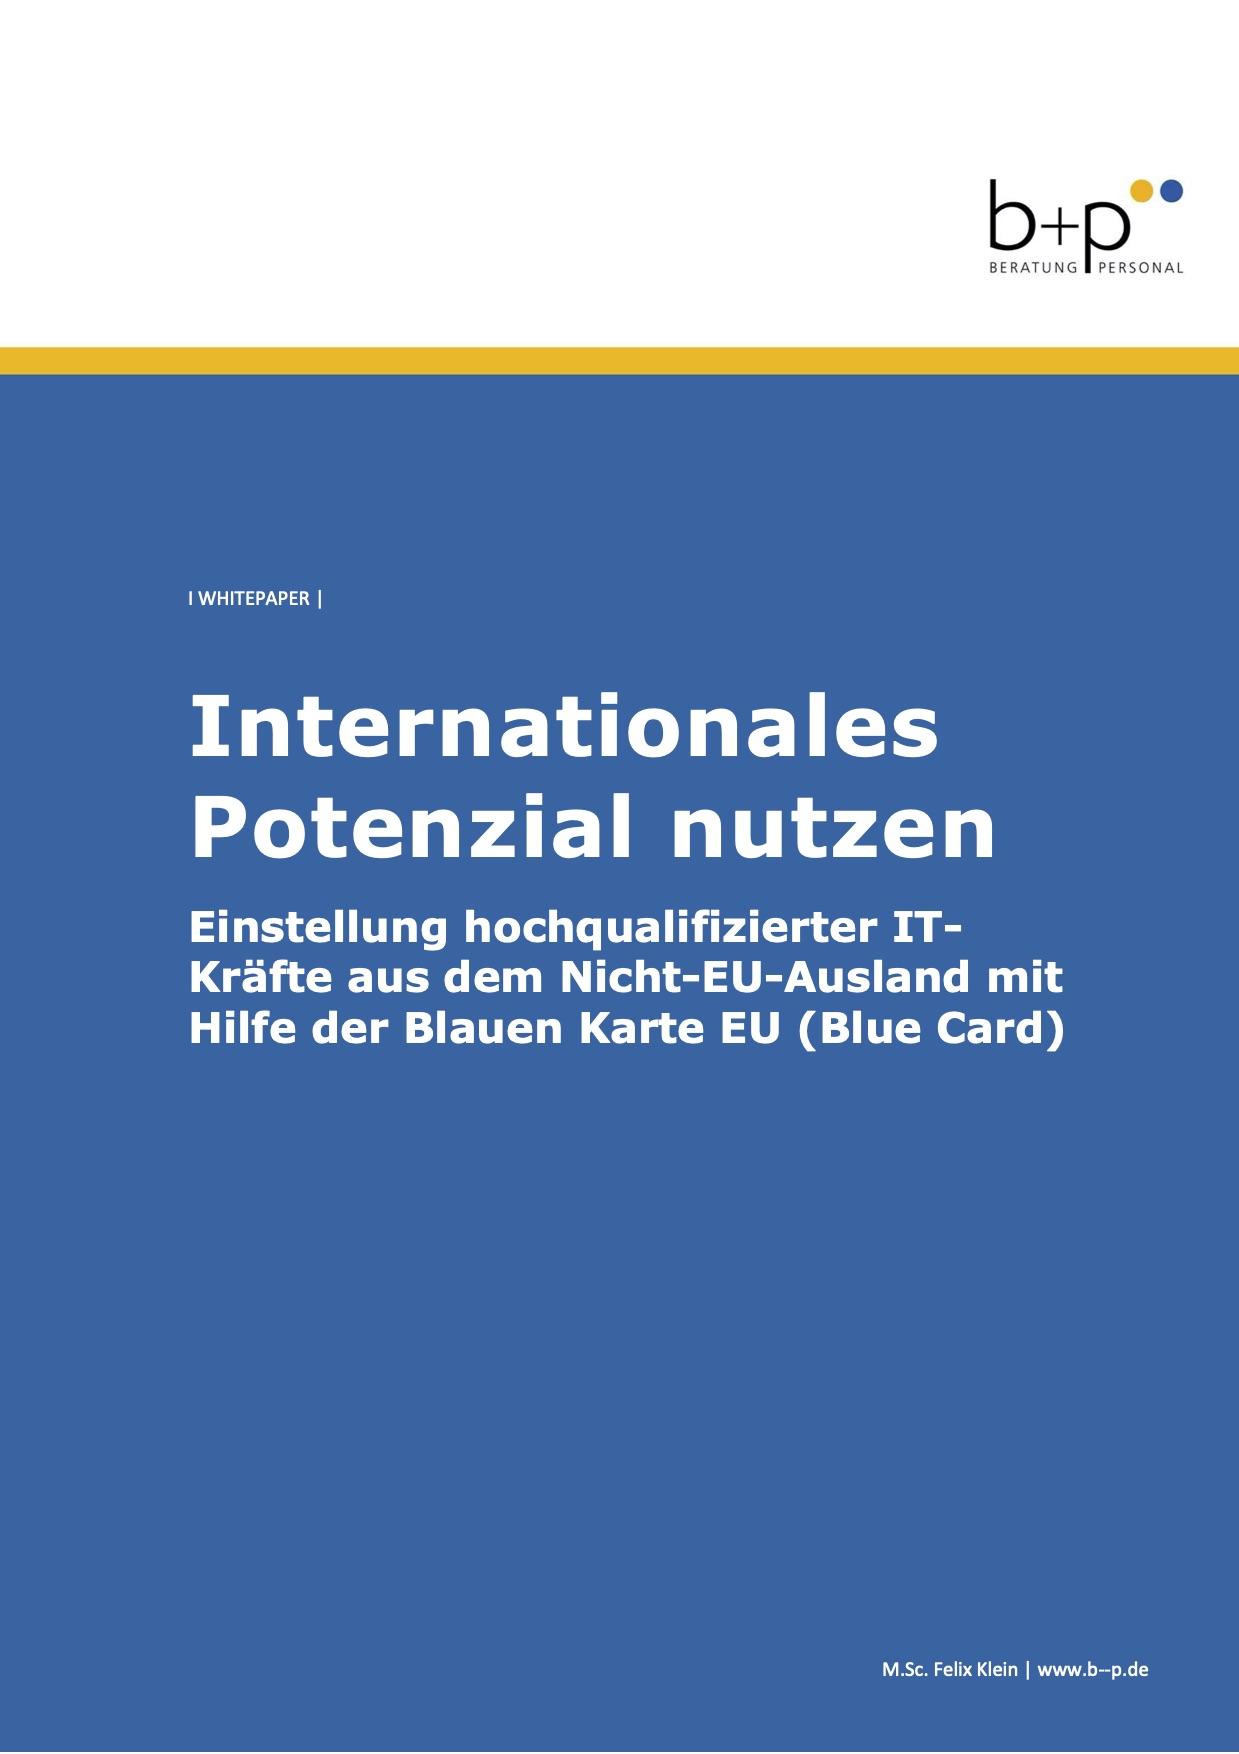 Internationales Potenzial nutzen